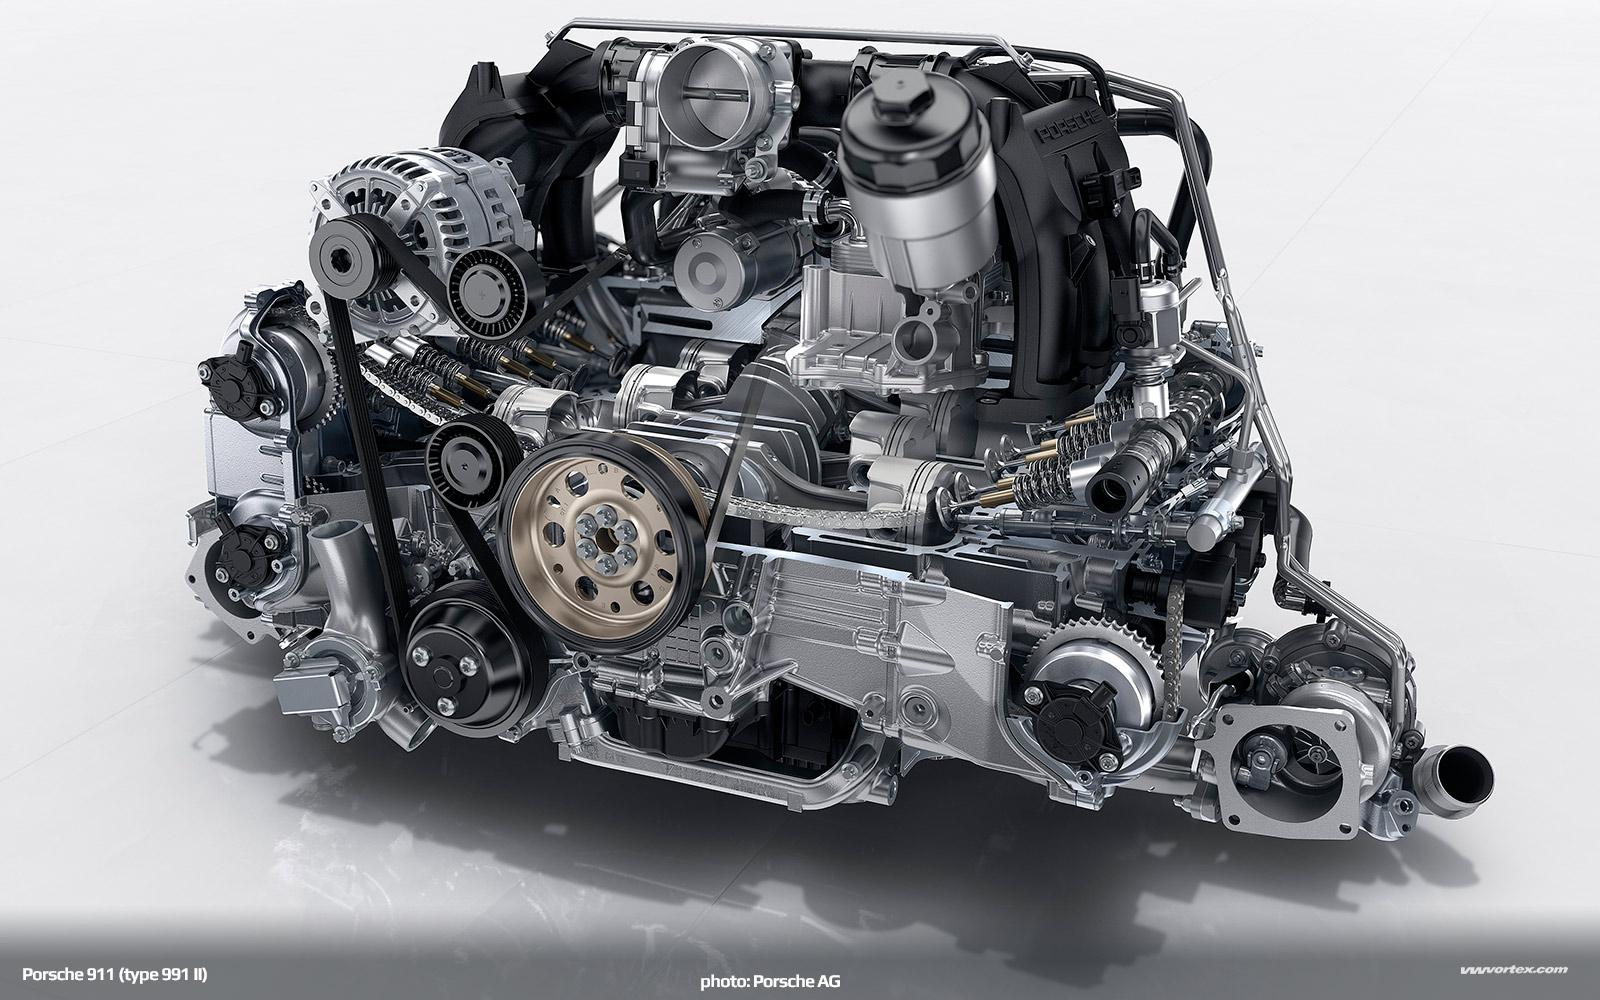 Porsche-911-991-ii-2016-499